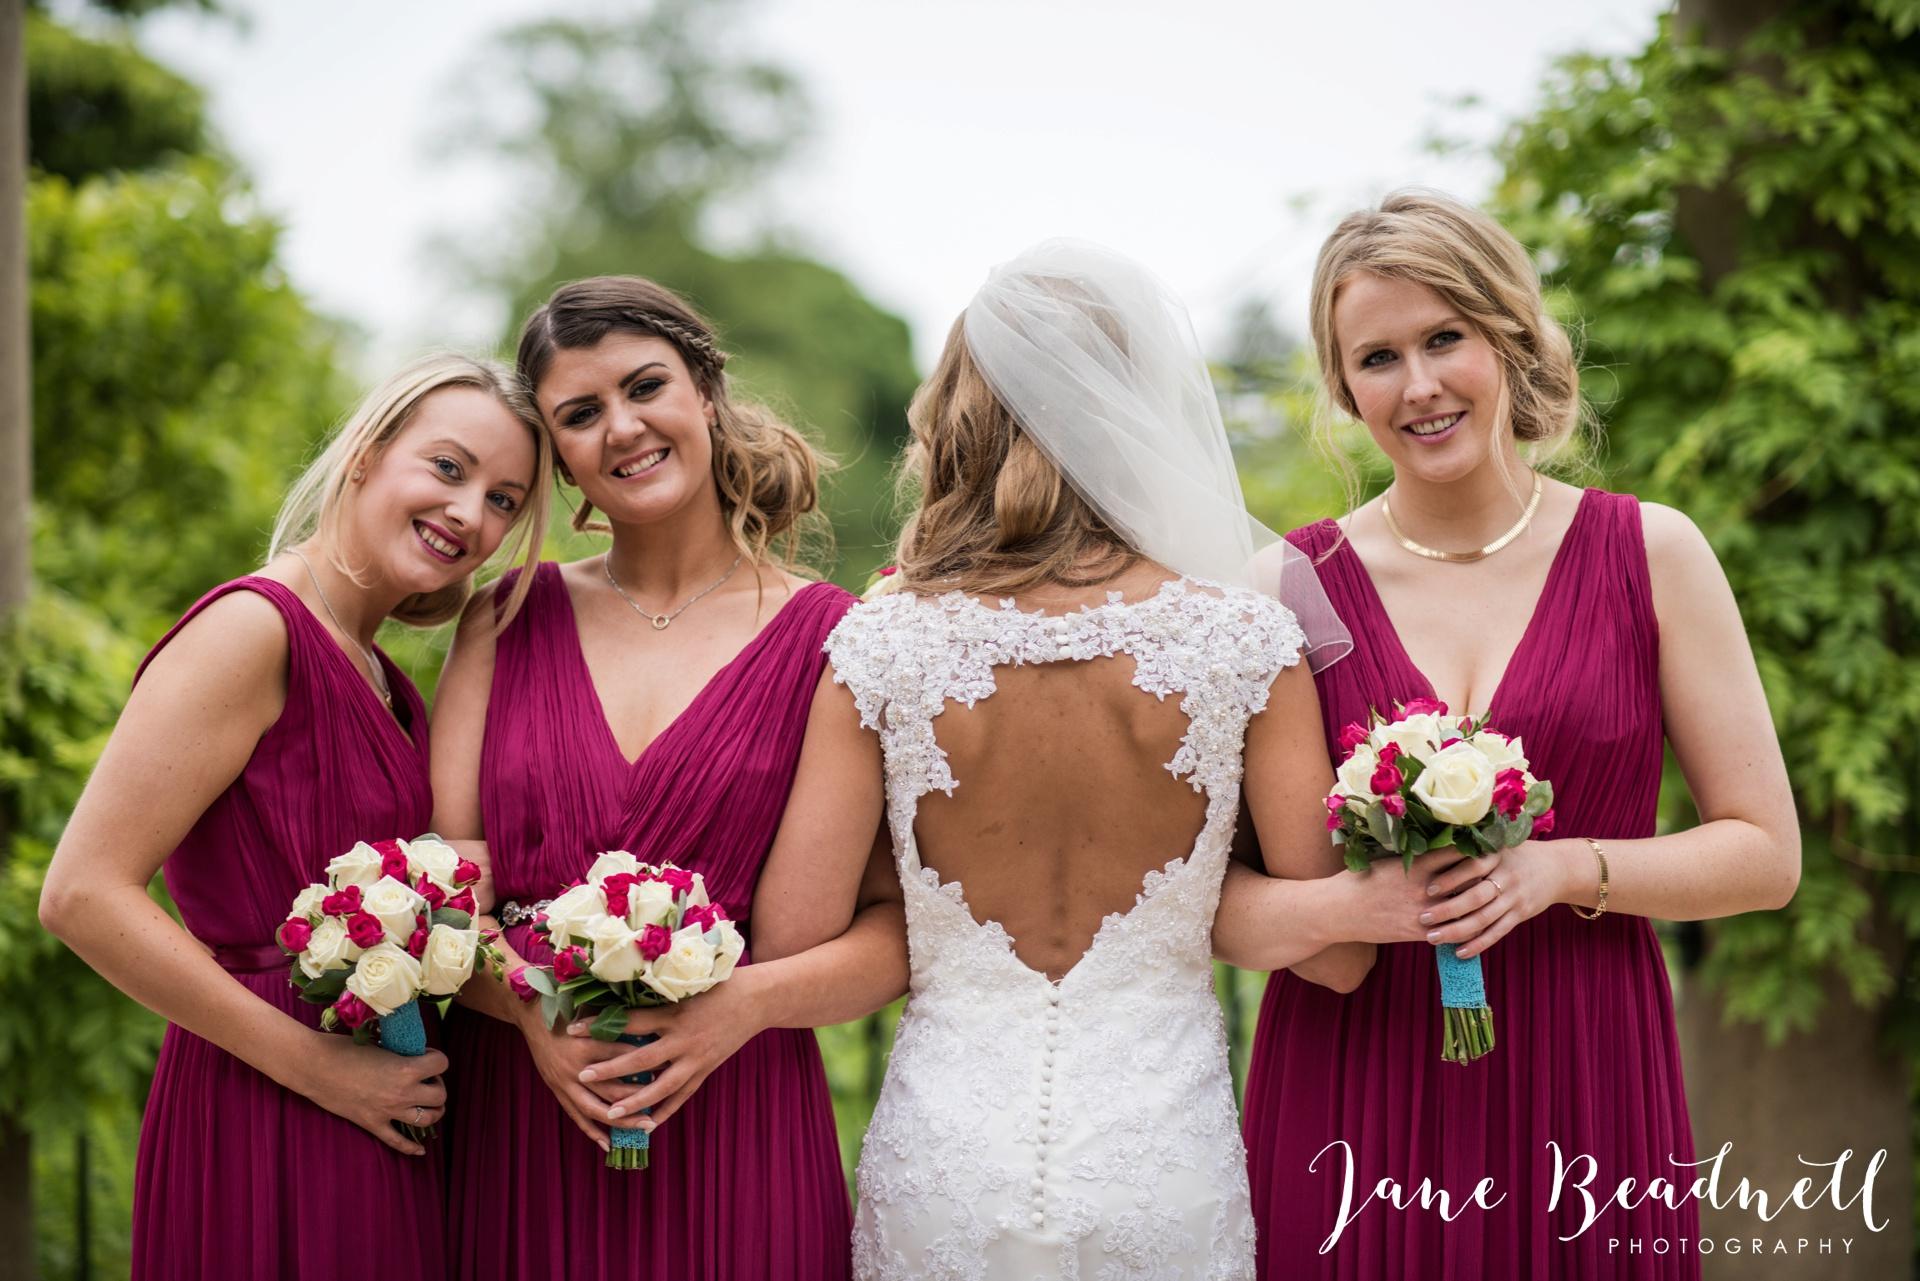 Jane Beadnell fine art wedding photographer Harrogate_0001